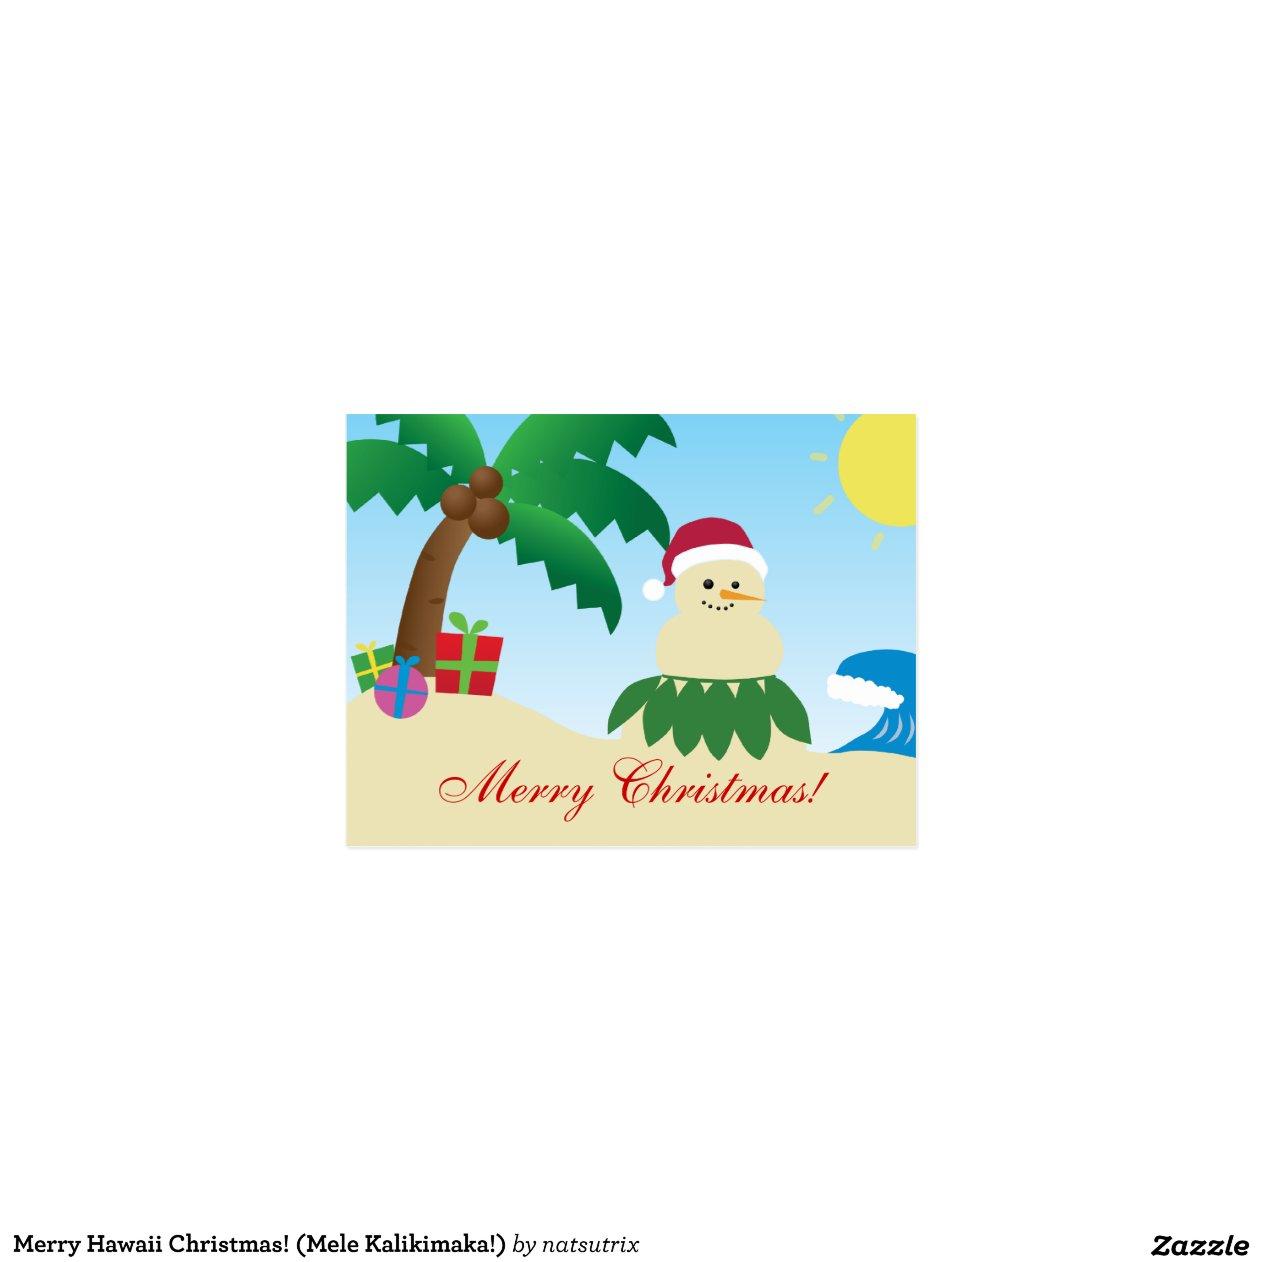 frohe hawaii weihnachten mele kalikimaka postkarte. Black Bedroom Furniture Sets. Home Design Ideas